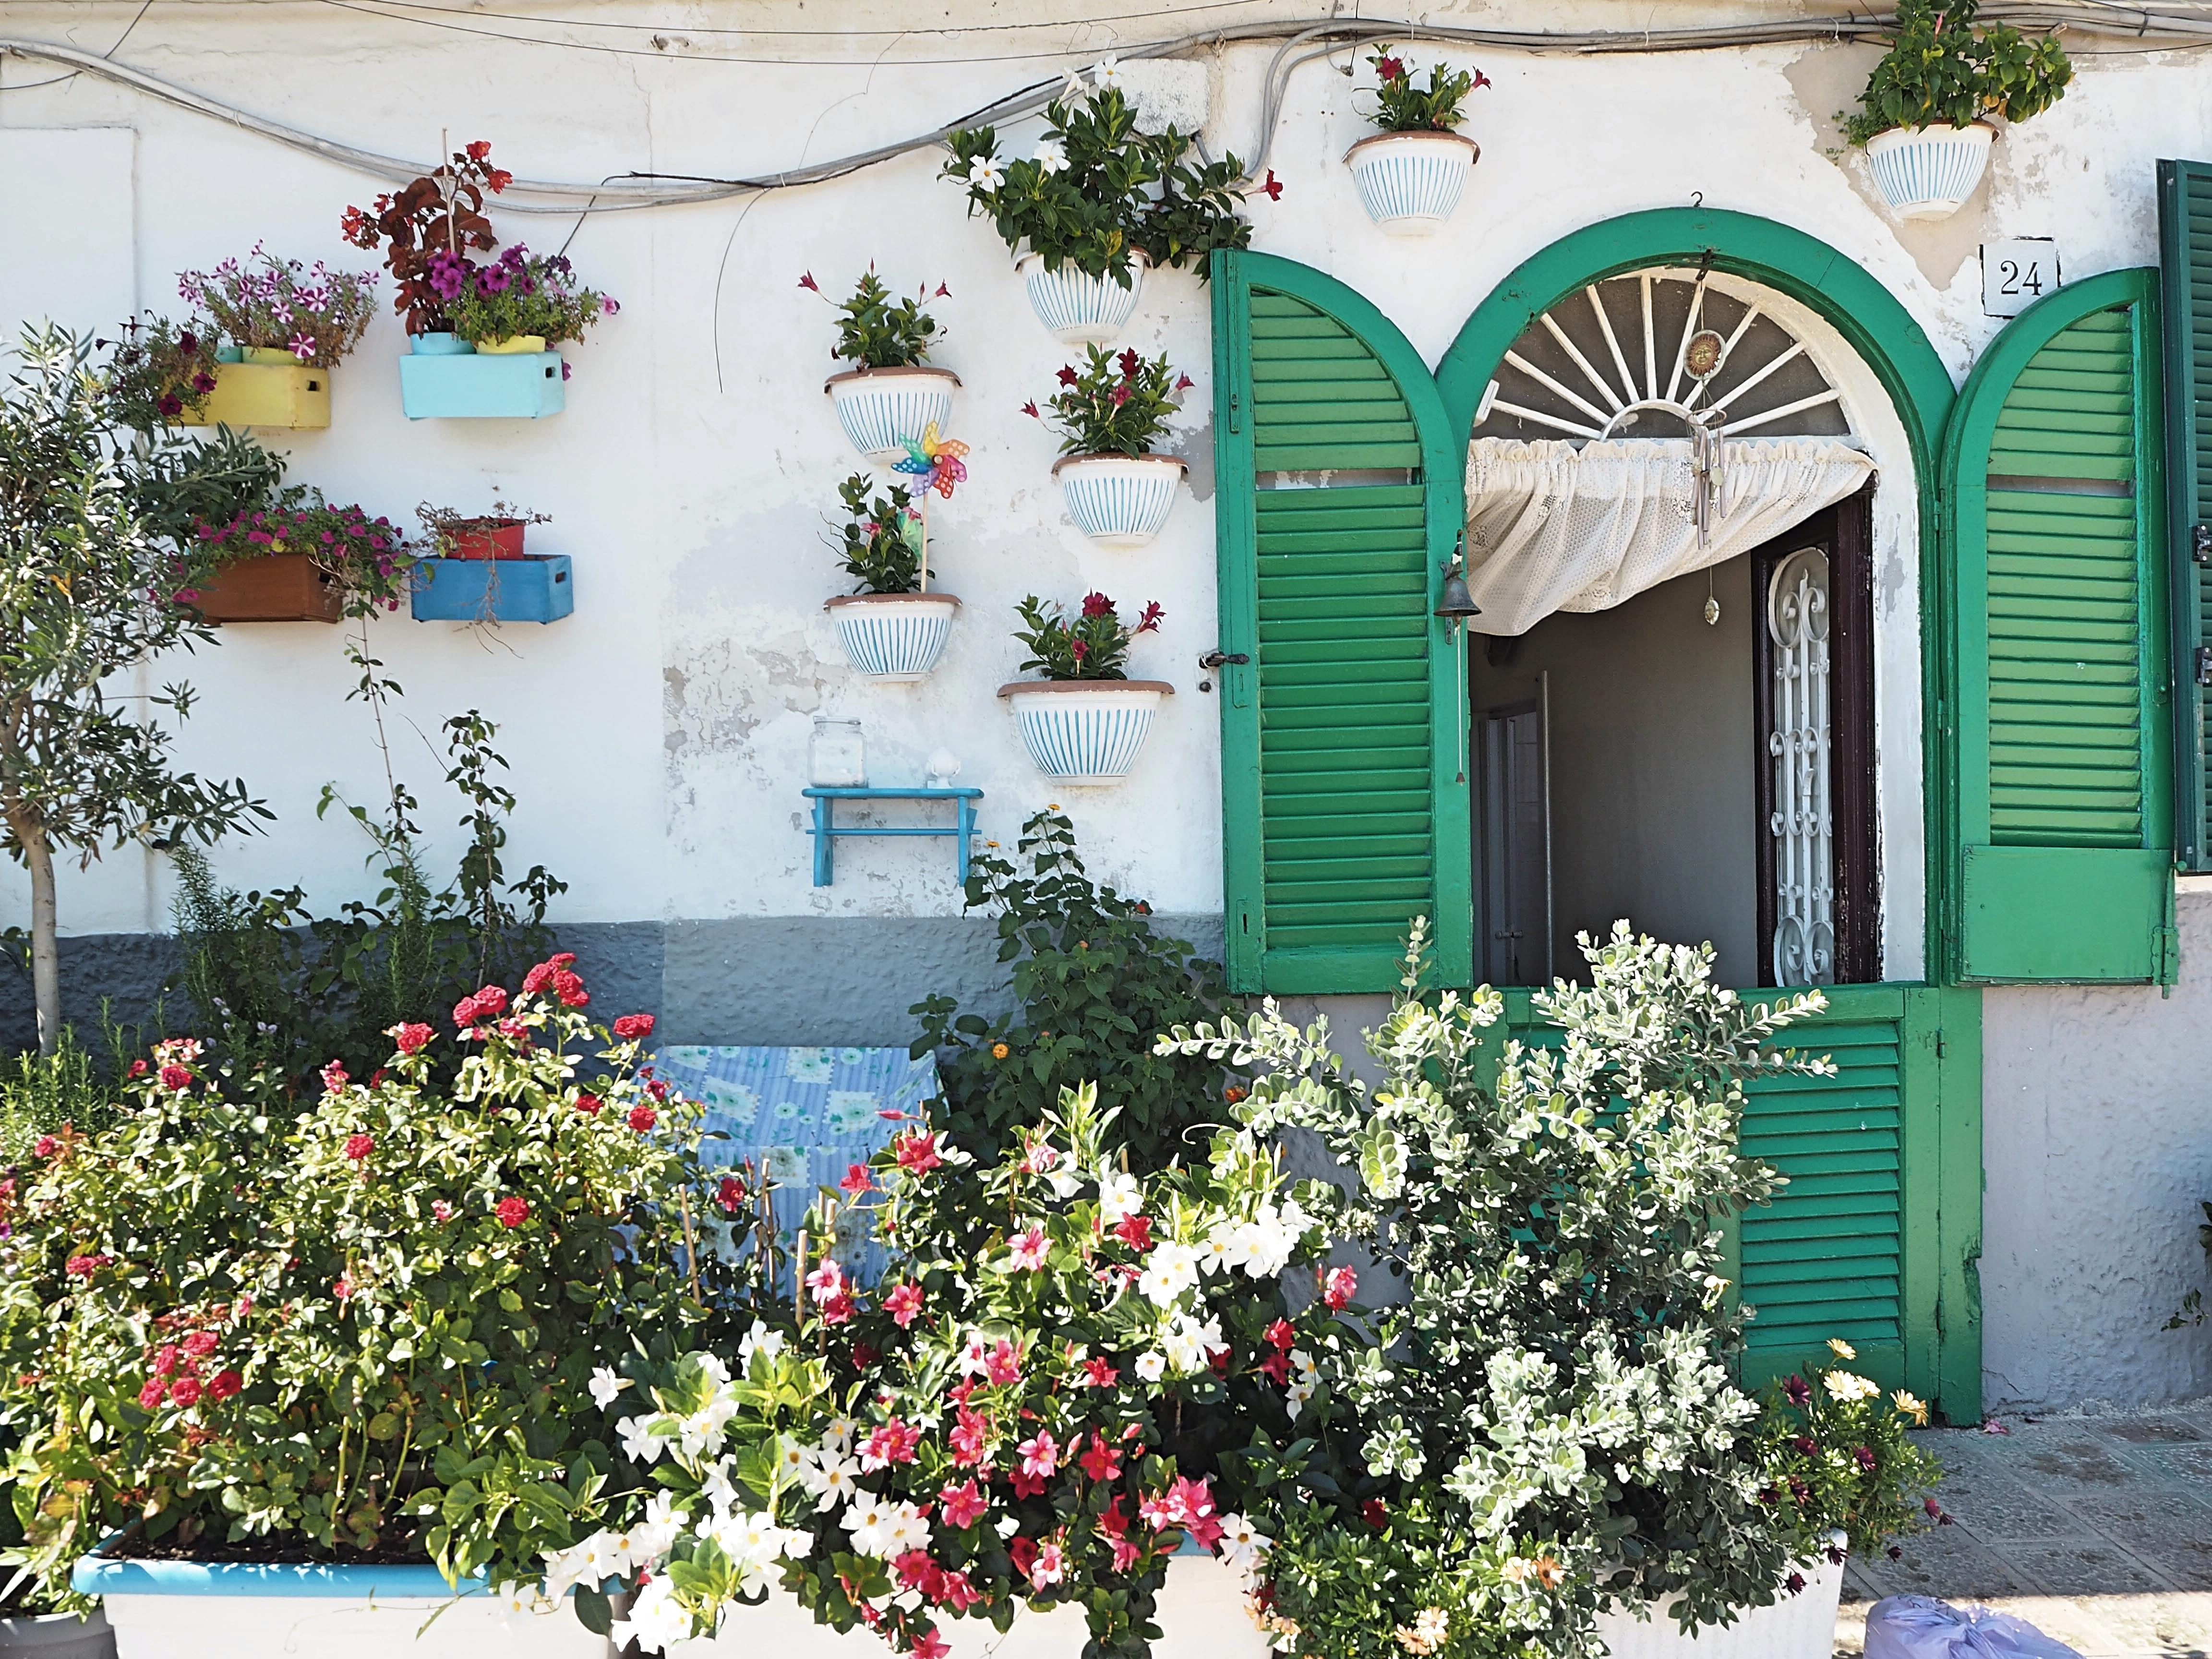 Bari Apulia